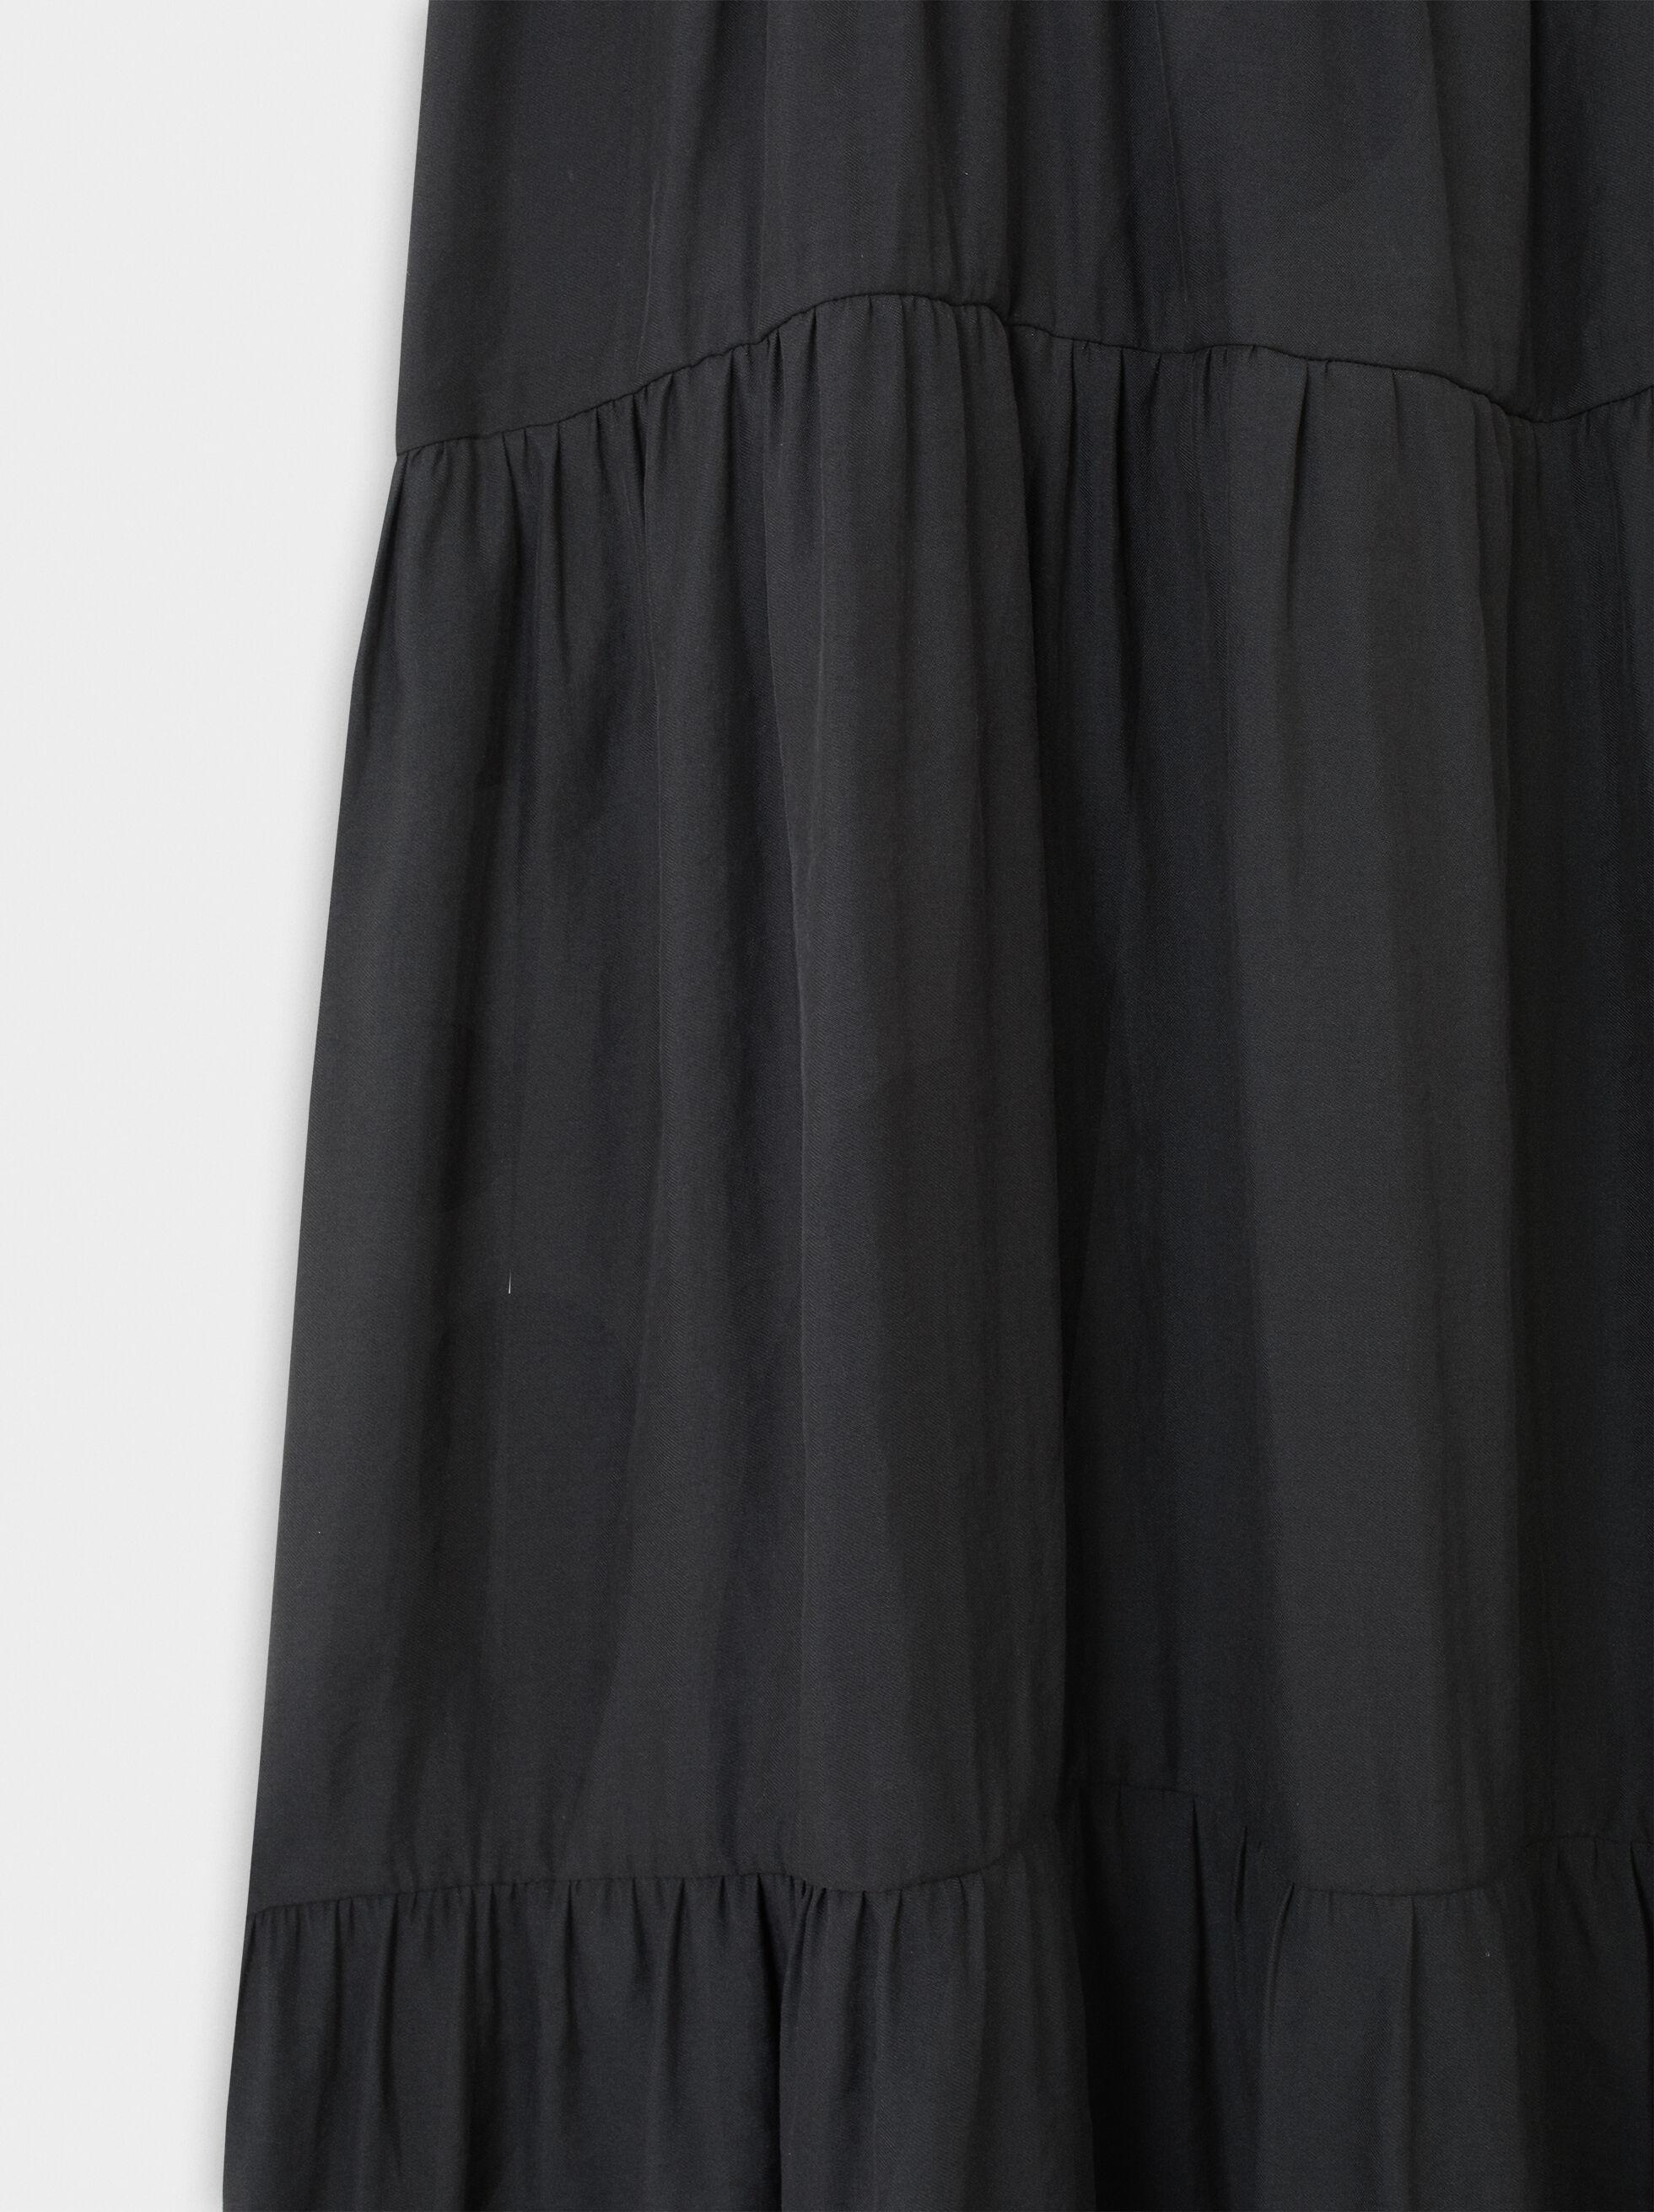 V-Neck Dress, Navy, hi-res